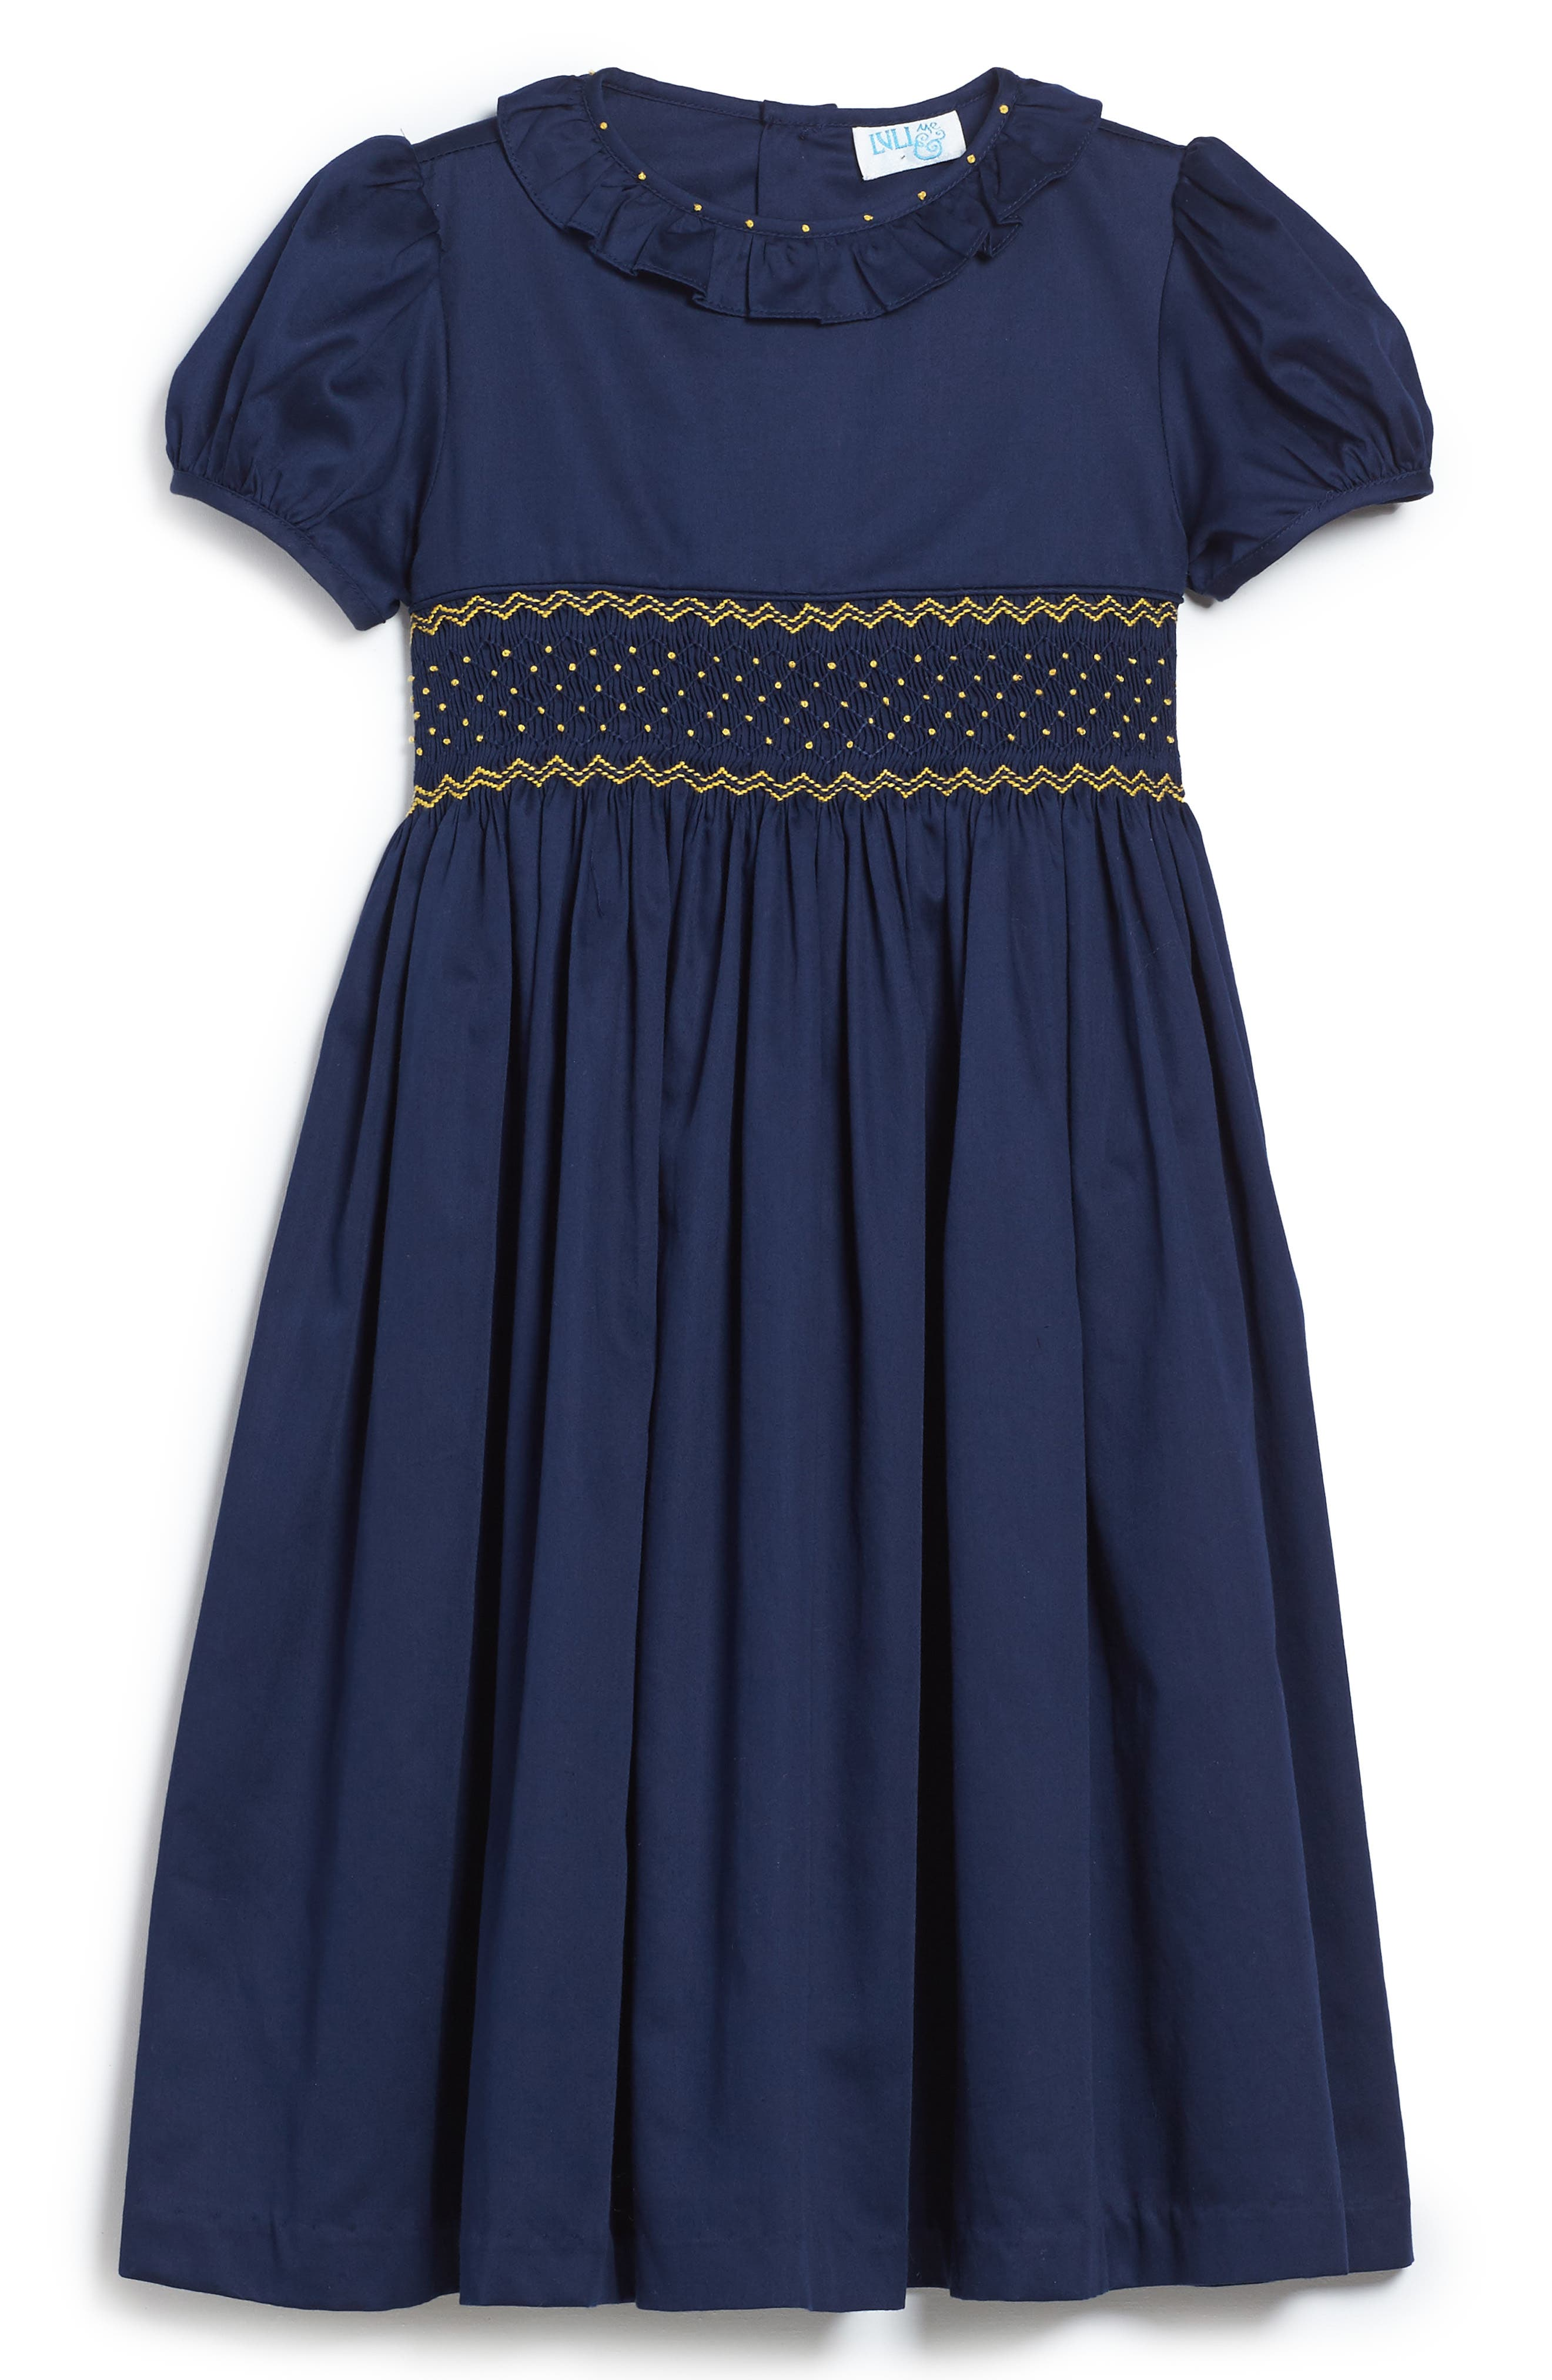 Smocked Dress,                         Main,                         color, Navy/ Gold